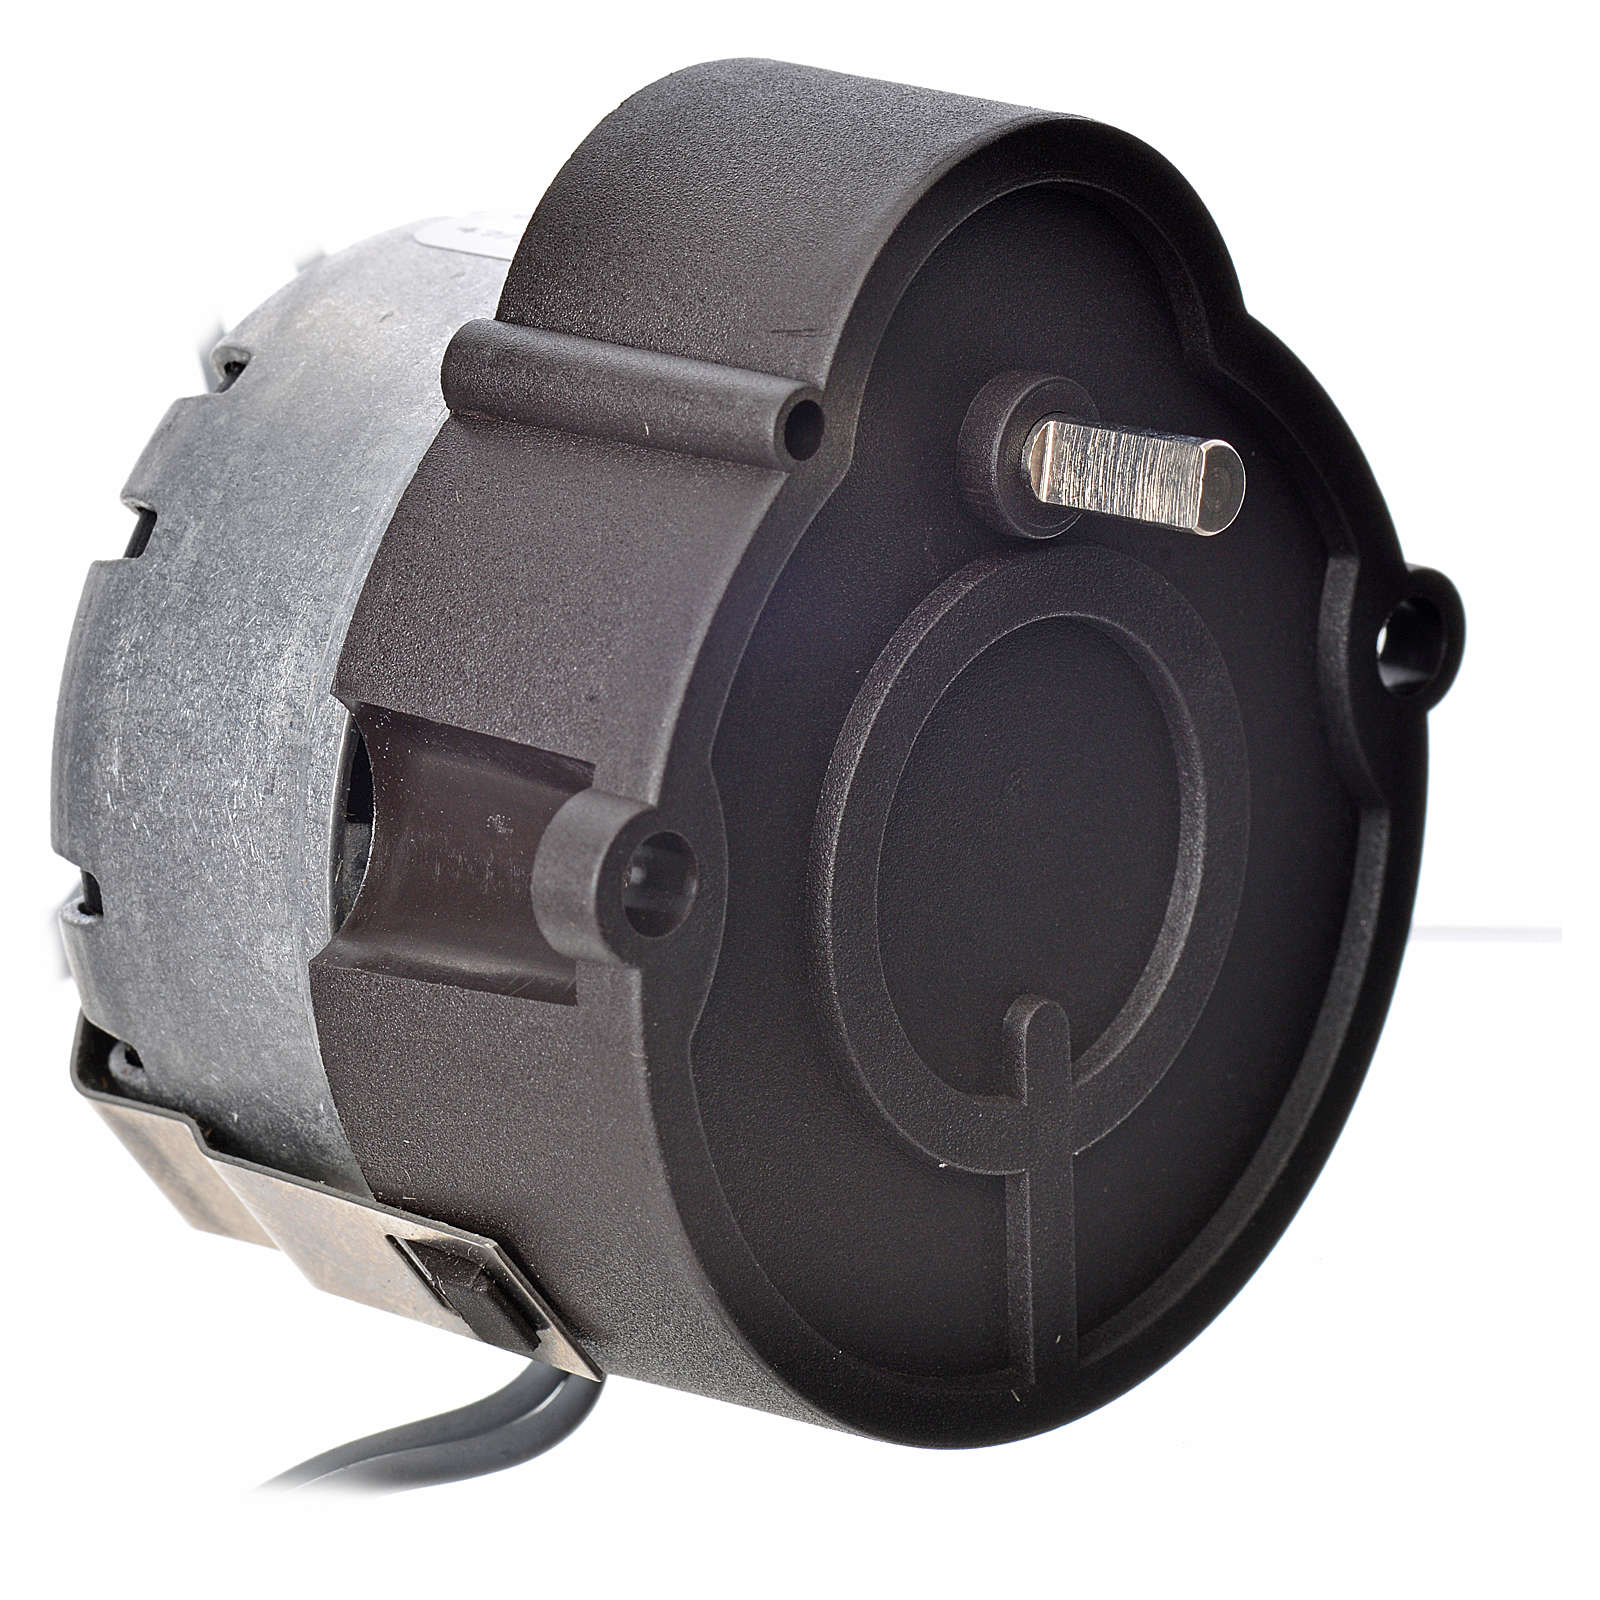 Nativity accessory, MR gear motor, 1 t/m 4